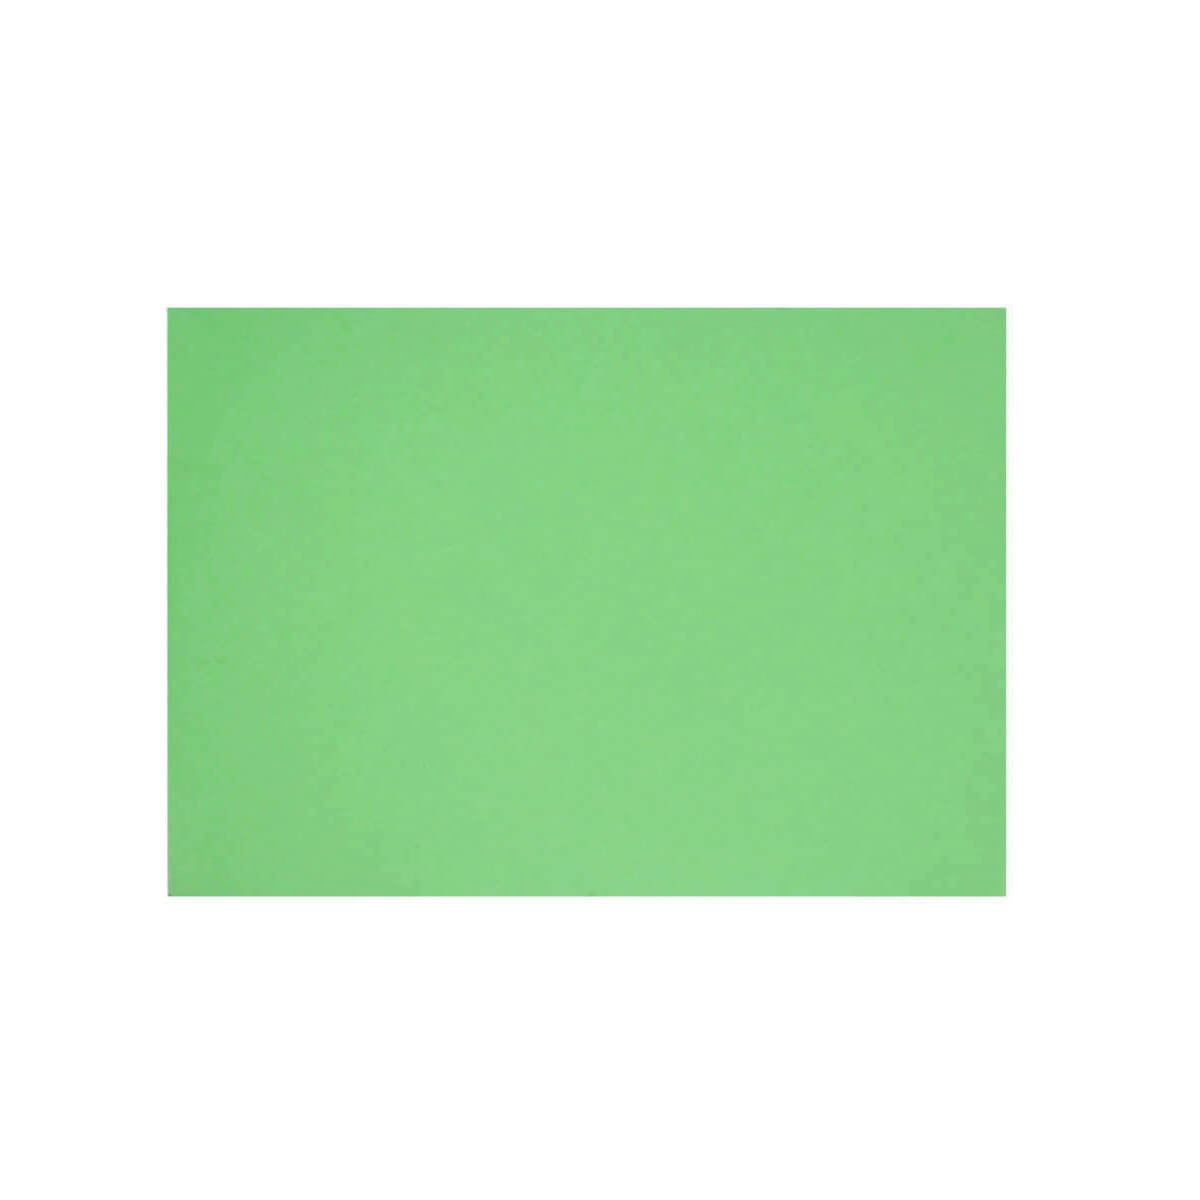 PALE GREEN 152 x 216mm ENVELOPES 120GSM